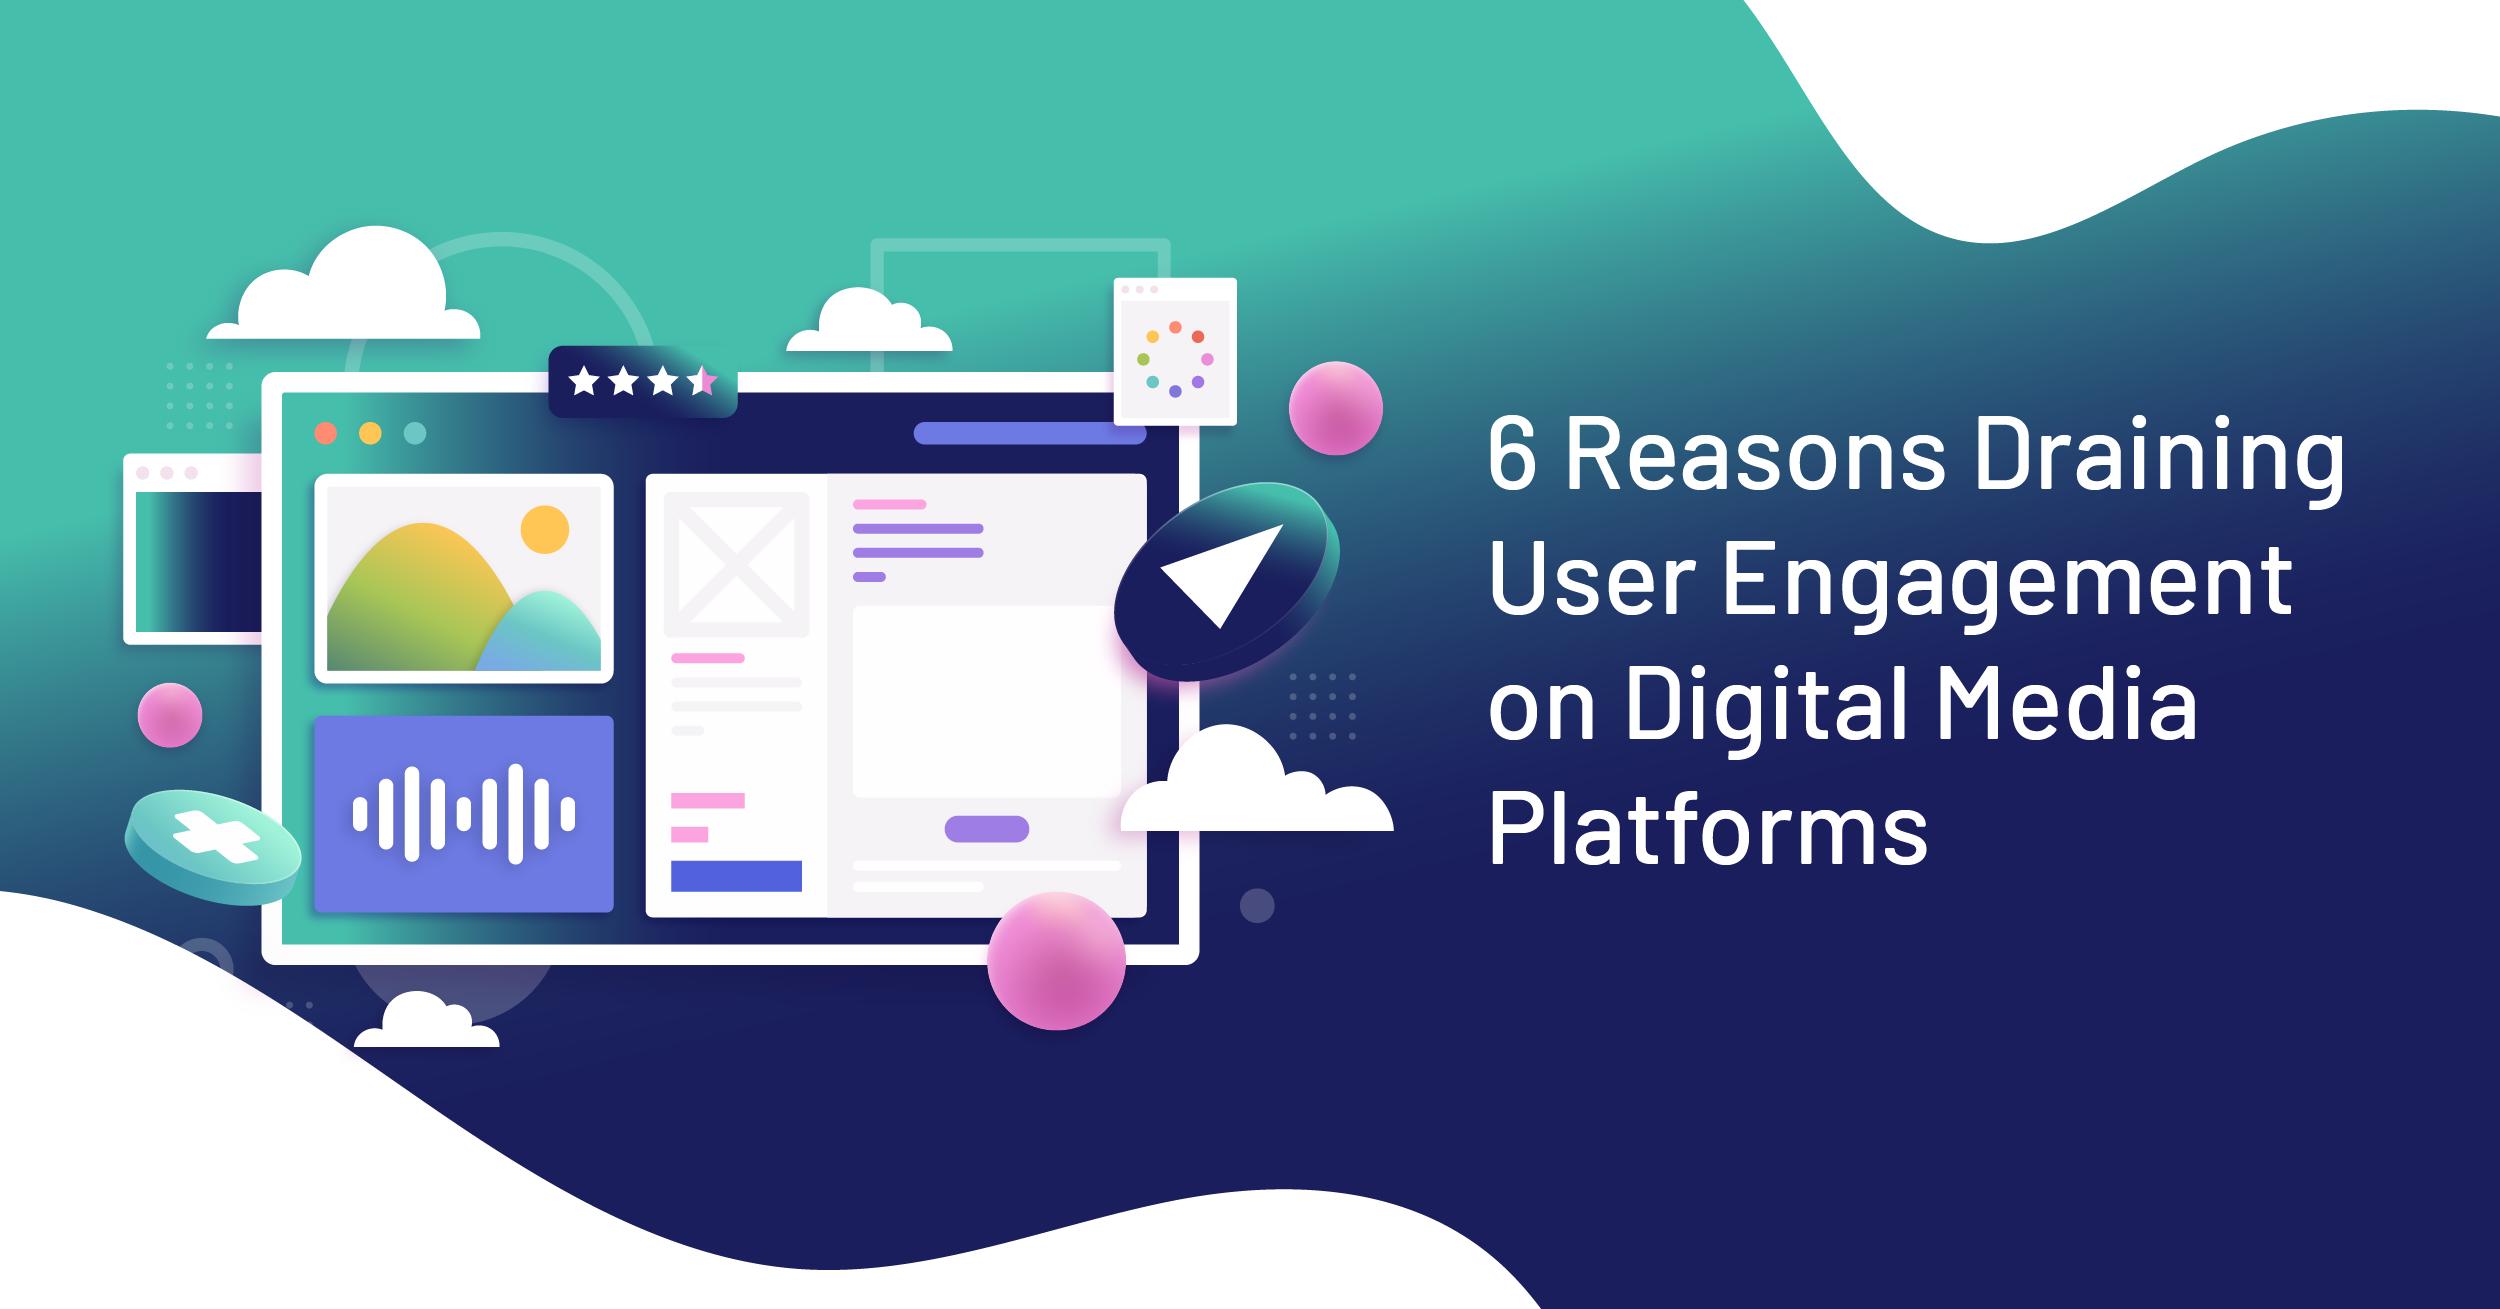 reasons draining user engagement on digital media platforms